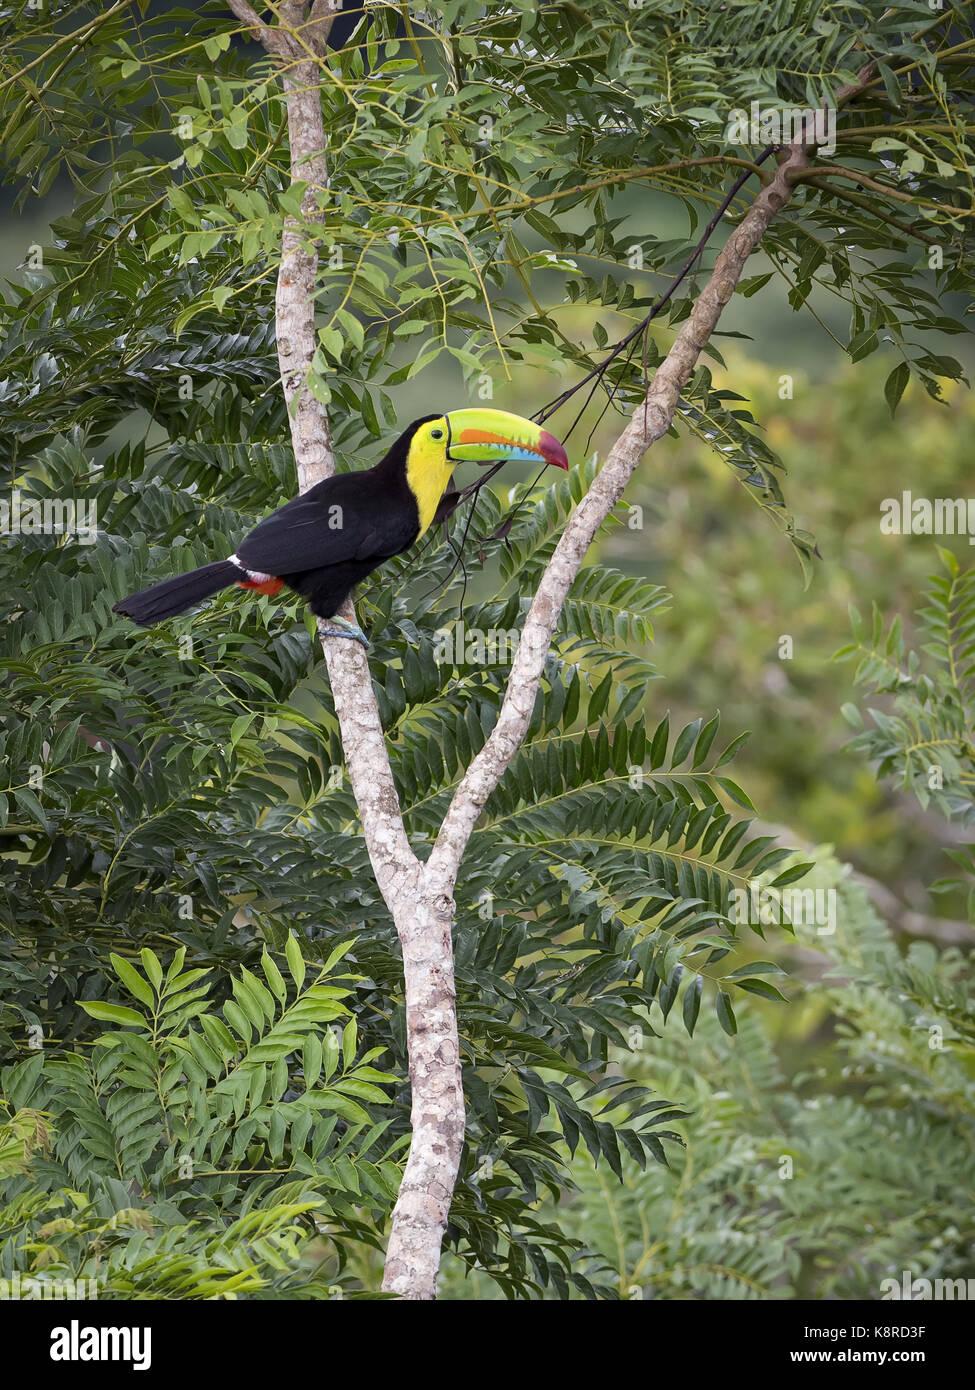 Kiel-billed Toucan (Ramphastos sulfuratus), Gamboa, Panama; Juni Stockbild